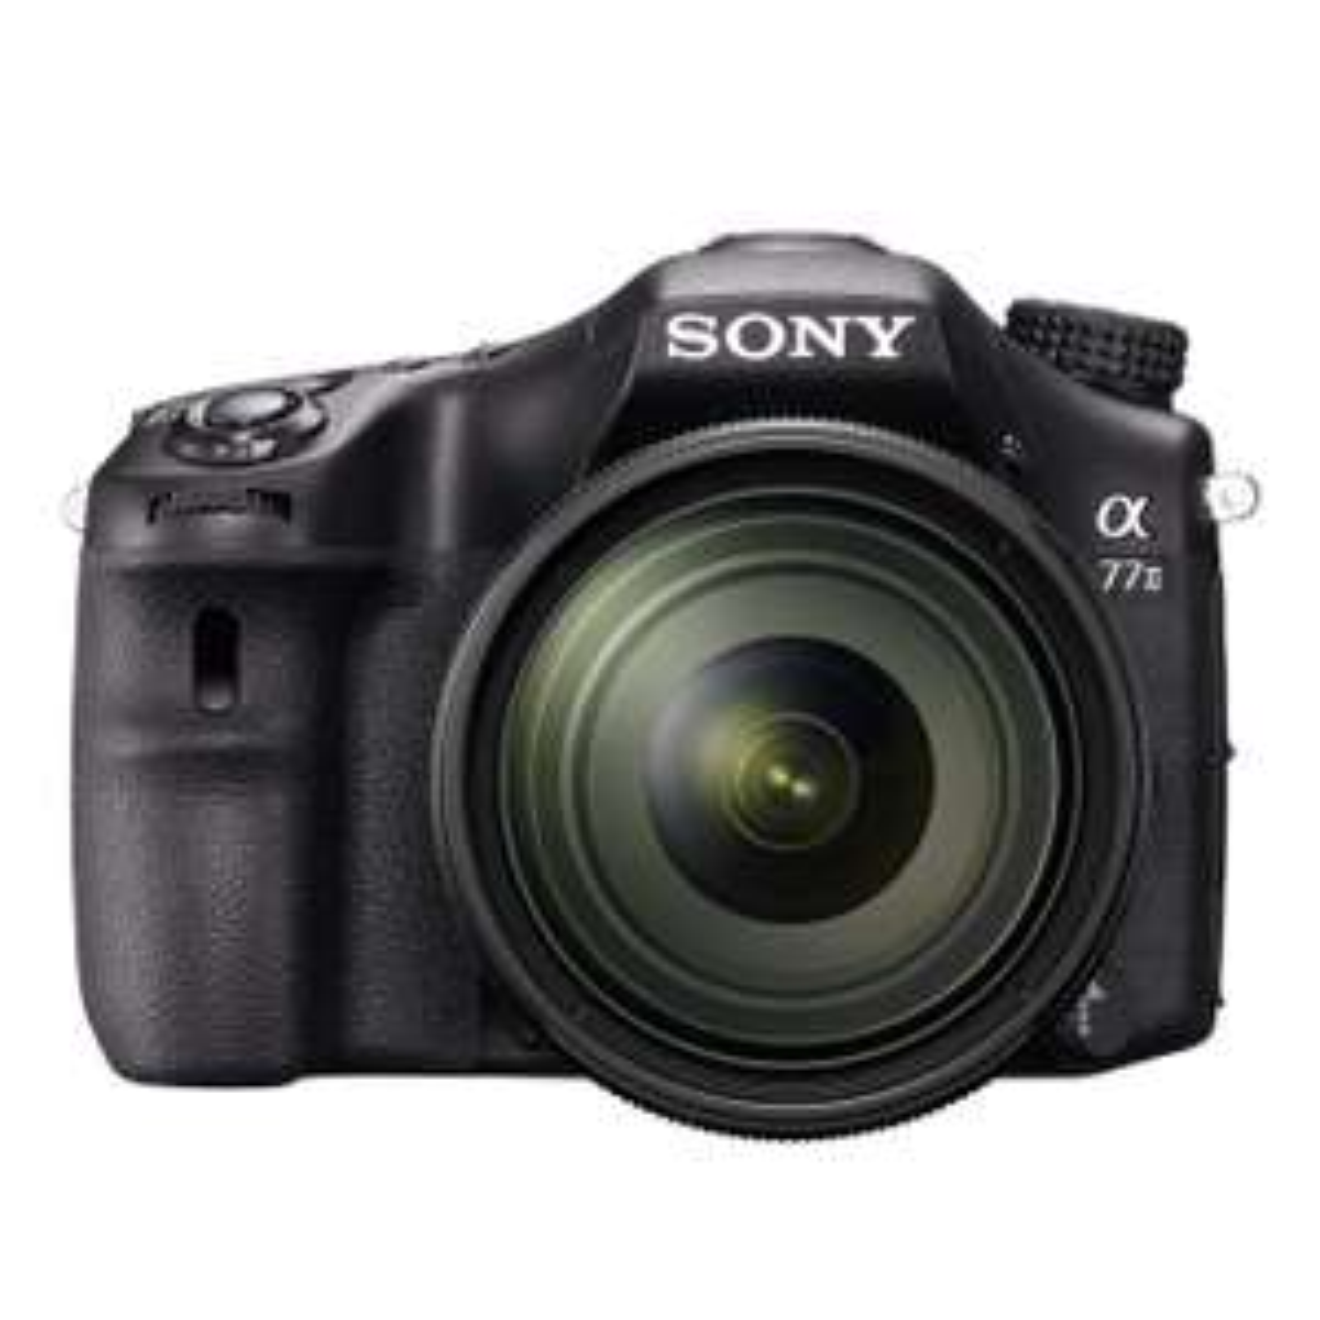 Sony Alpha 77 II Kit inkl. DT 16-50mm f2.8 SSM (SAL-1650) Objektiv für 1.002,04€ [Amazon.it] 151° Sony Alpha 77 II Kit inkl. DT 16-50mm f2.8 SSM (SAL-1650) Objektiv für 1.002,04€ [Amazon.es]